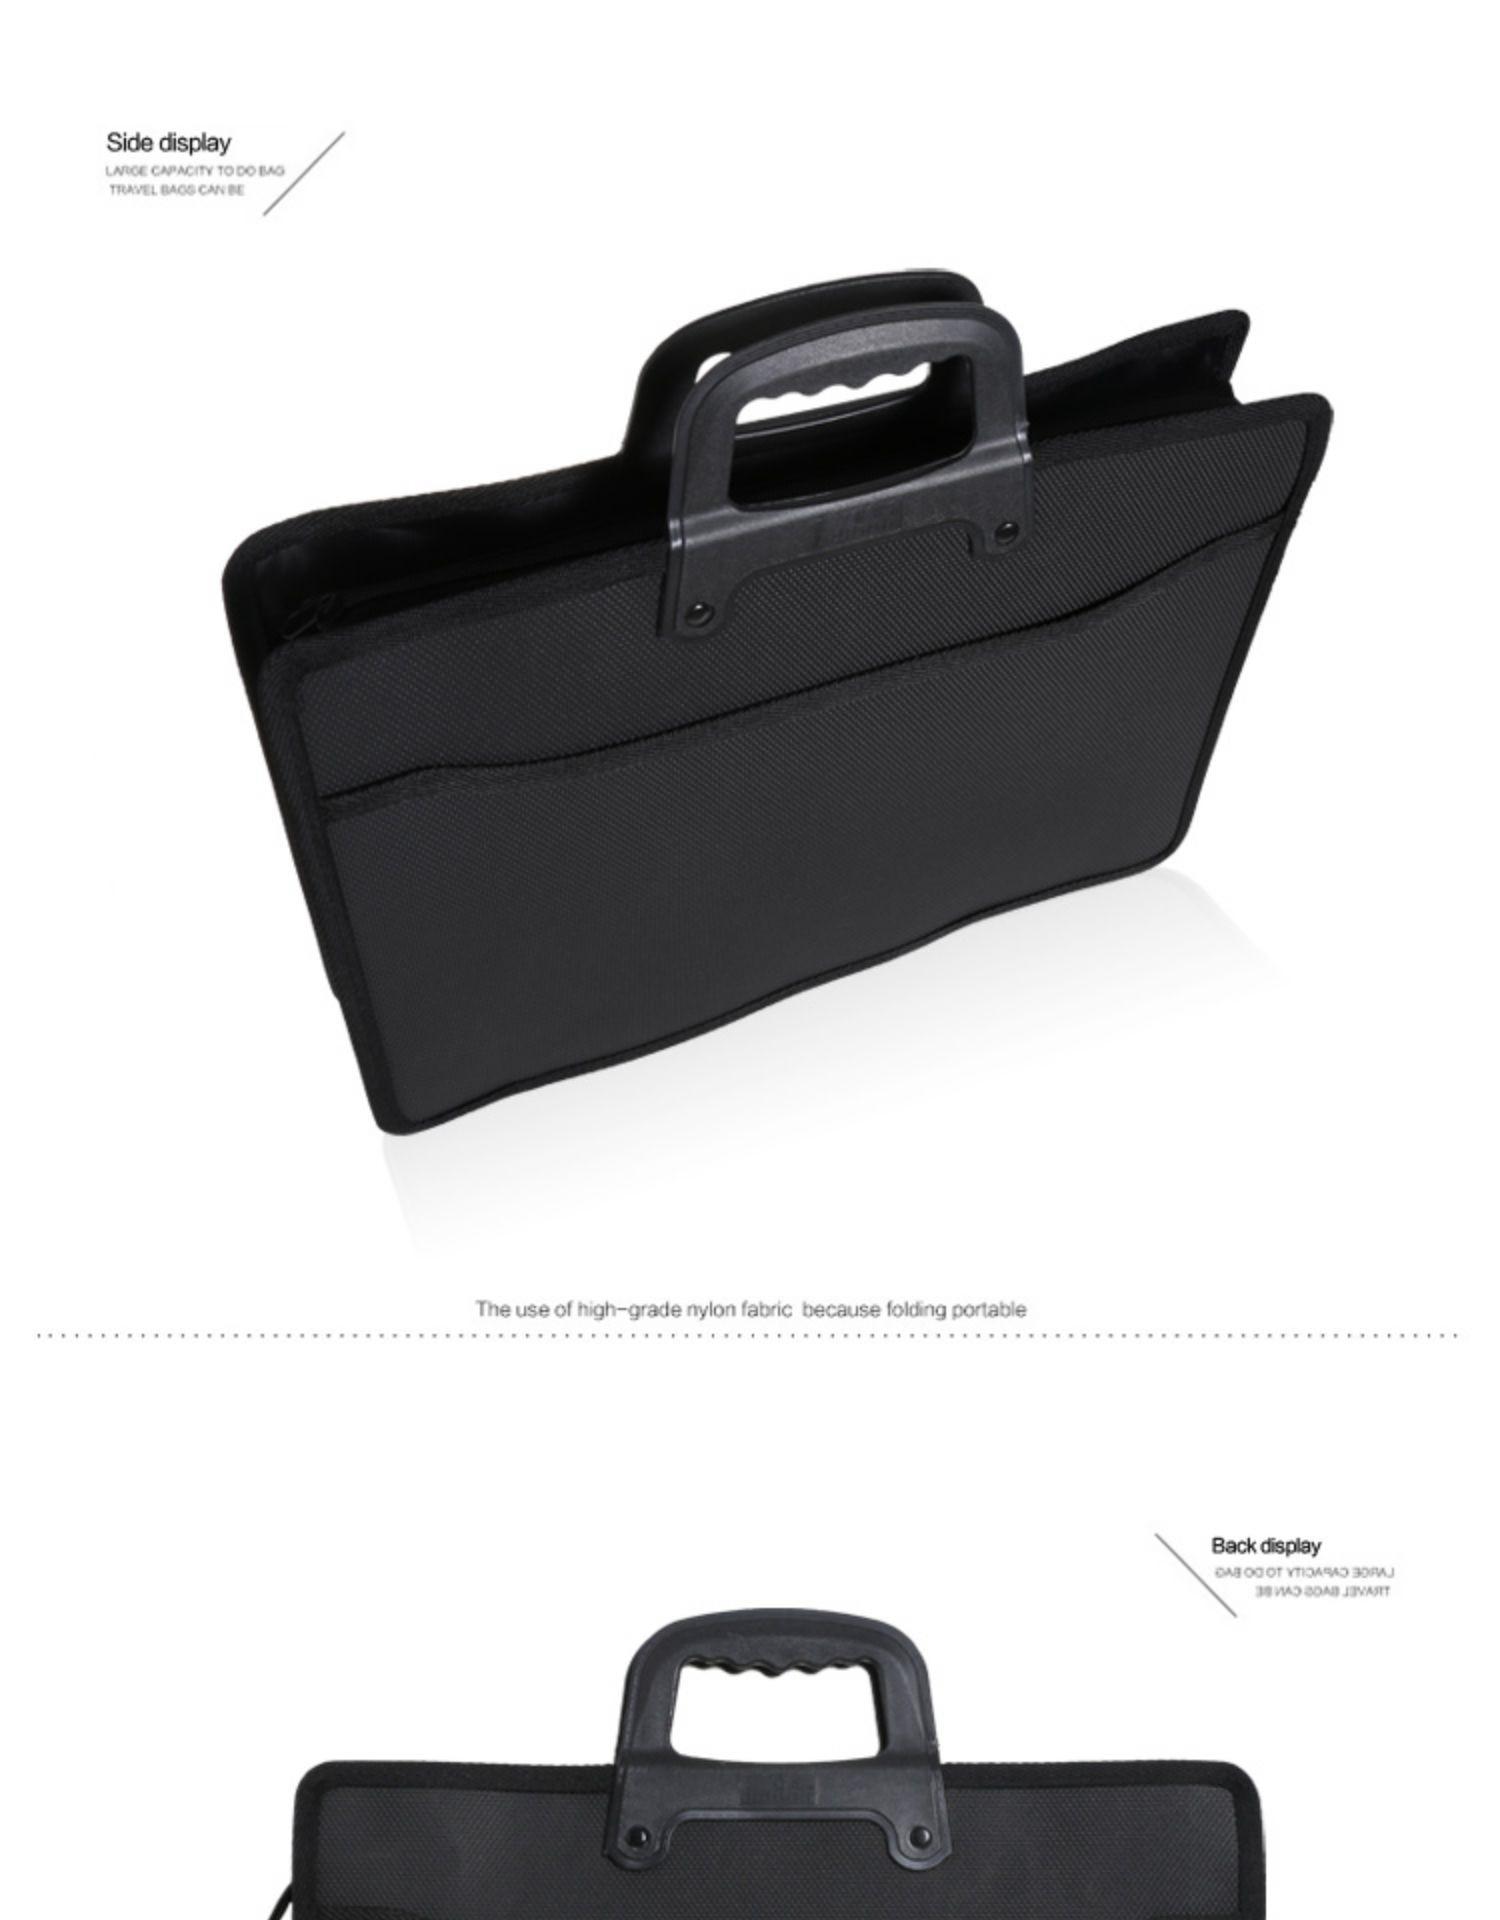 HTB1be89XGSs3KVjSZPiq6AsiVXap Fashion file bag portable briefcase men business office bag trend package work bag file A4 conference bag Oxford waterproof